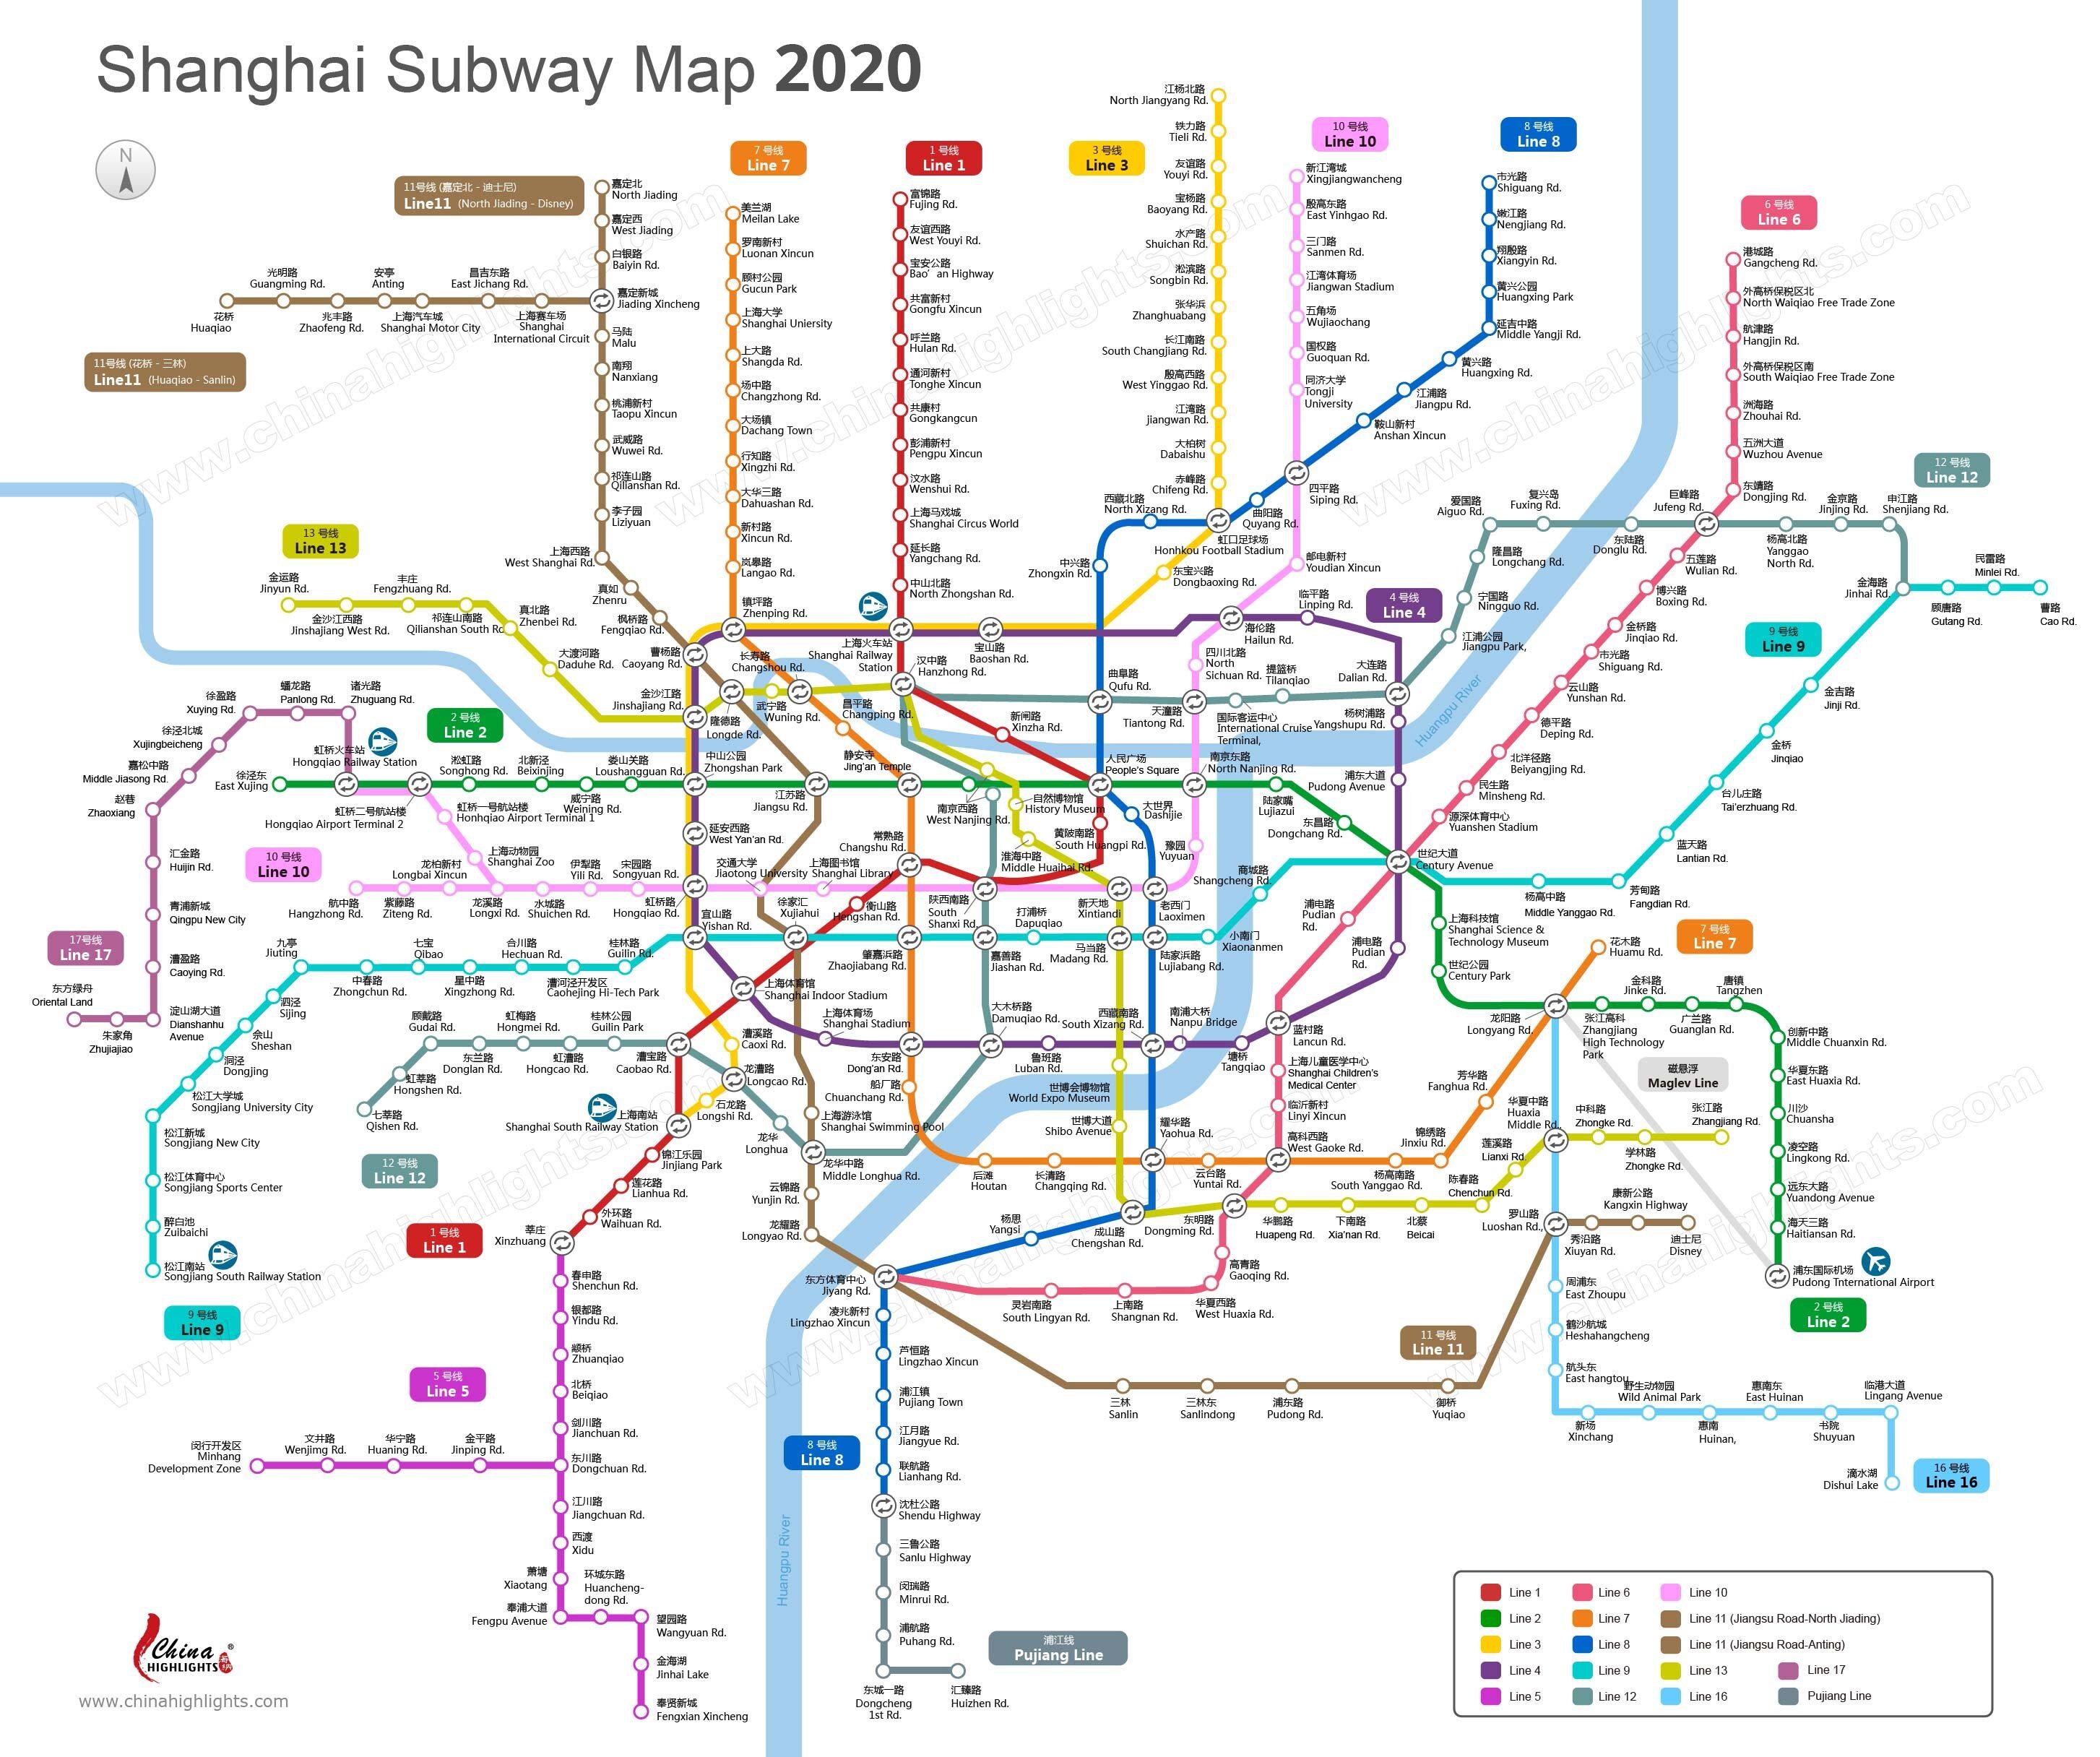 Subway Map Of Shanghai.Shanghai Subway Shanghai Metro Map Updated 2020